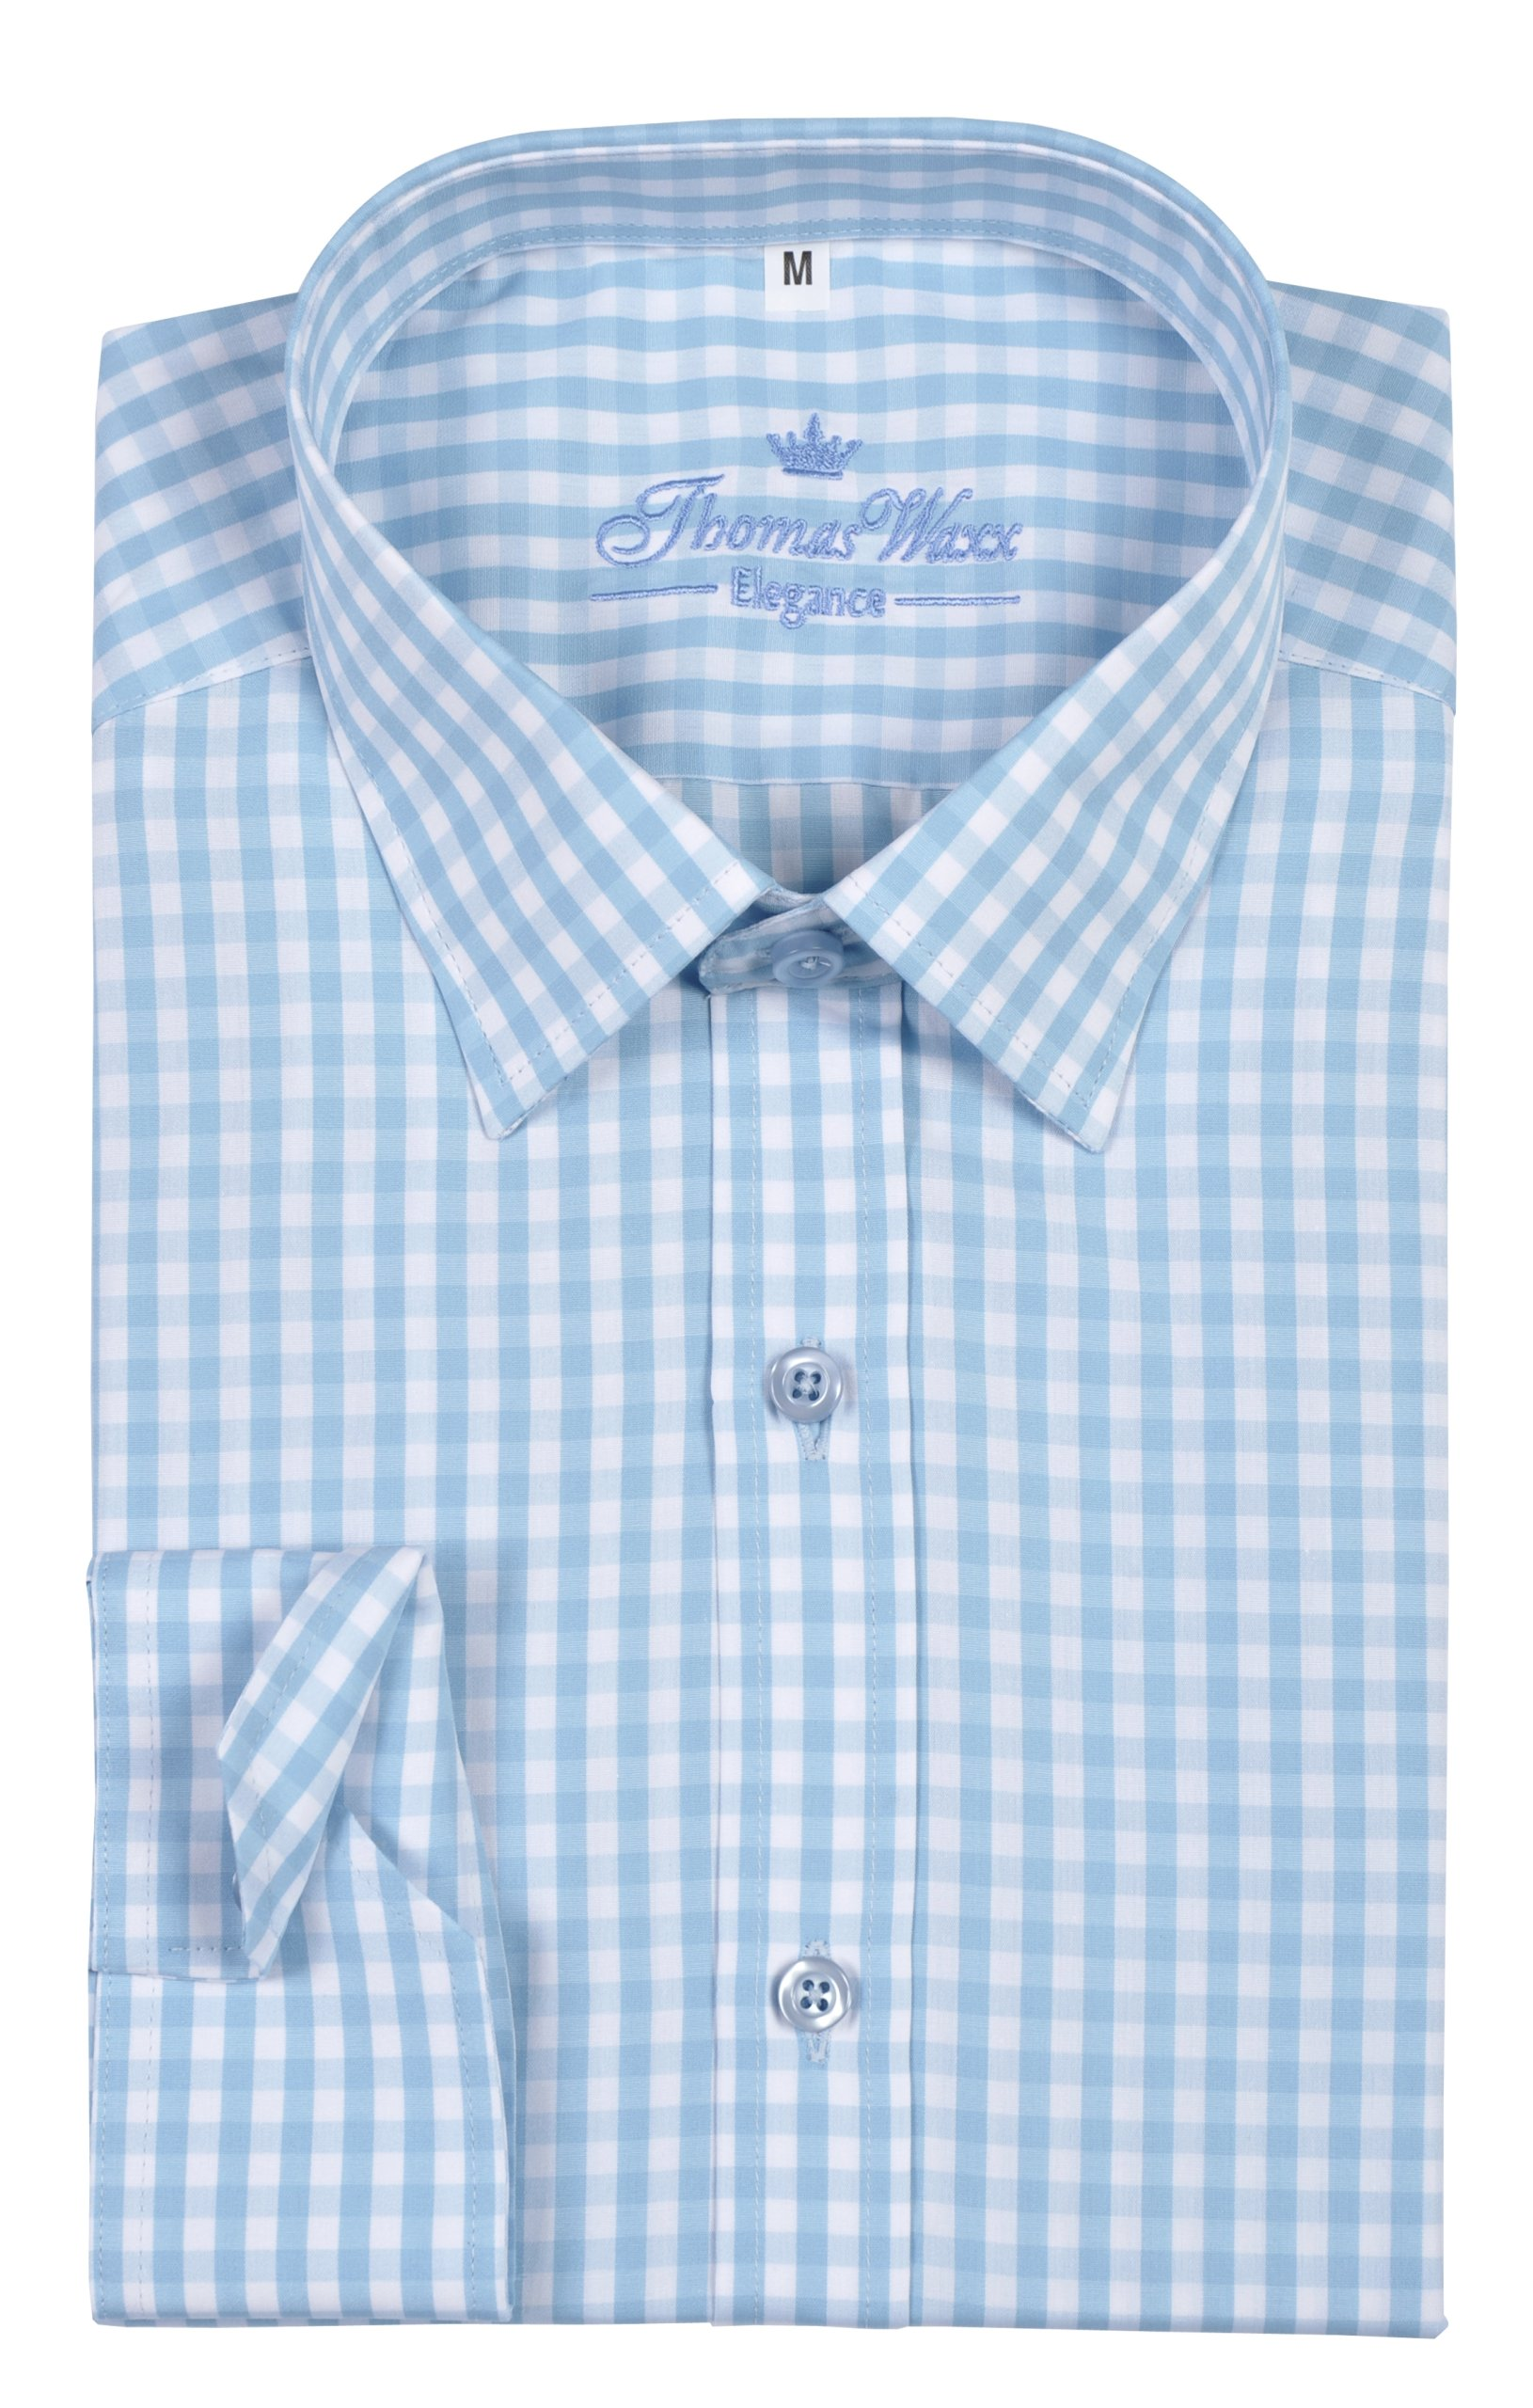 Koszula Męska Thomas Waxx XL , różne wzory 7247546481  o6QxH